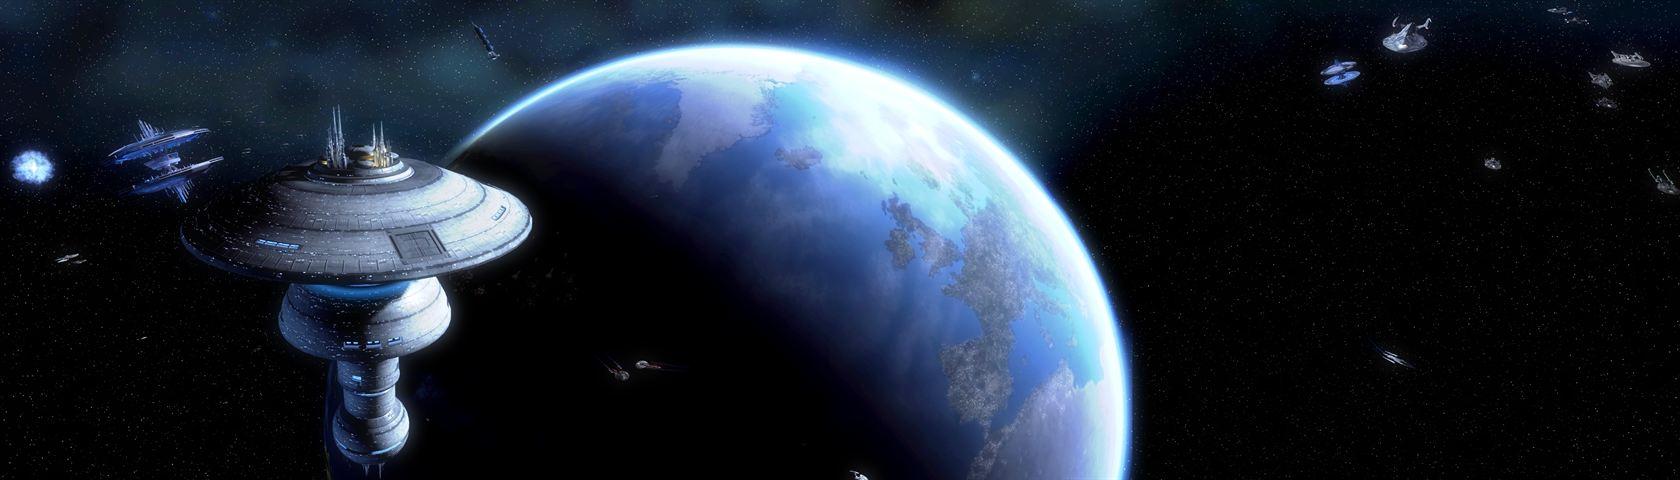 Star Trek Earth Space Dock